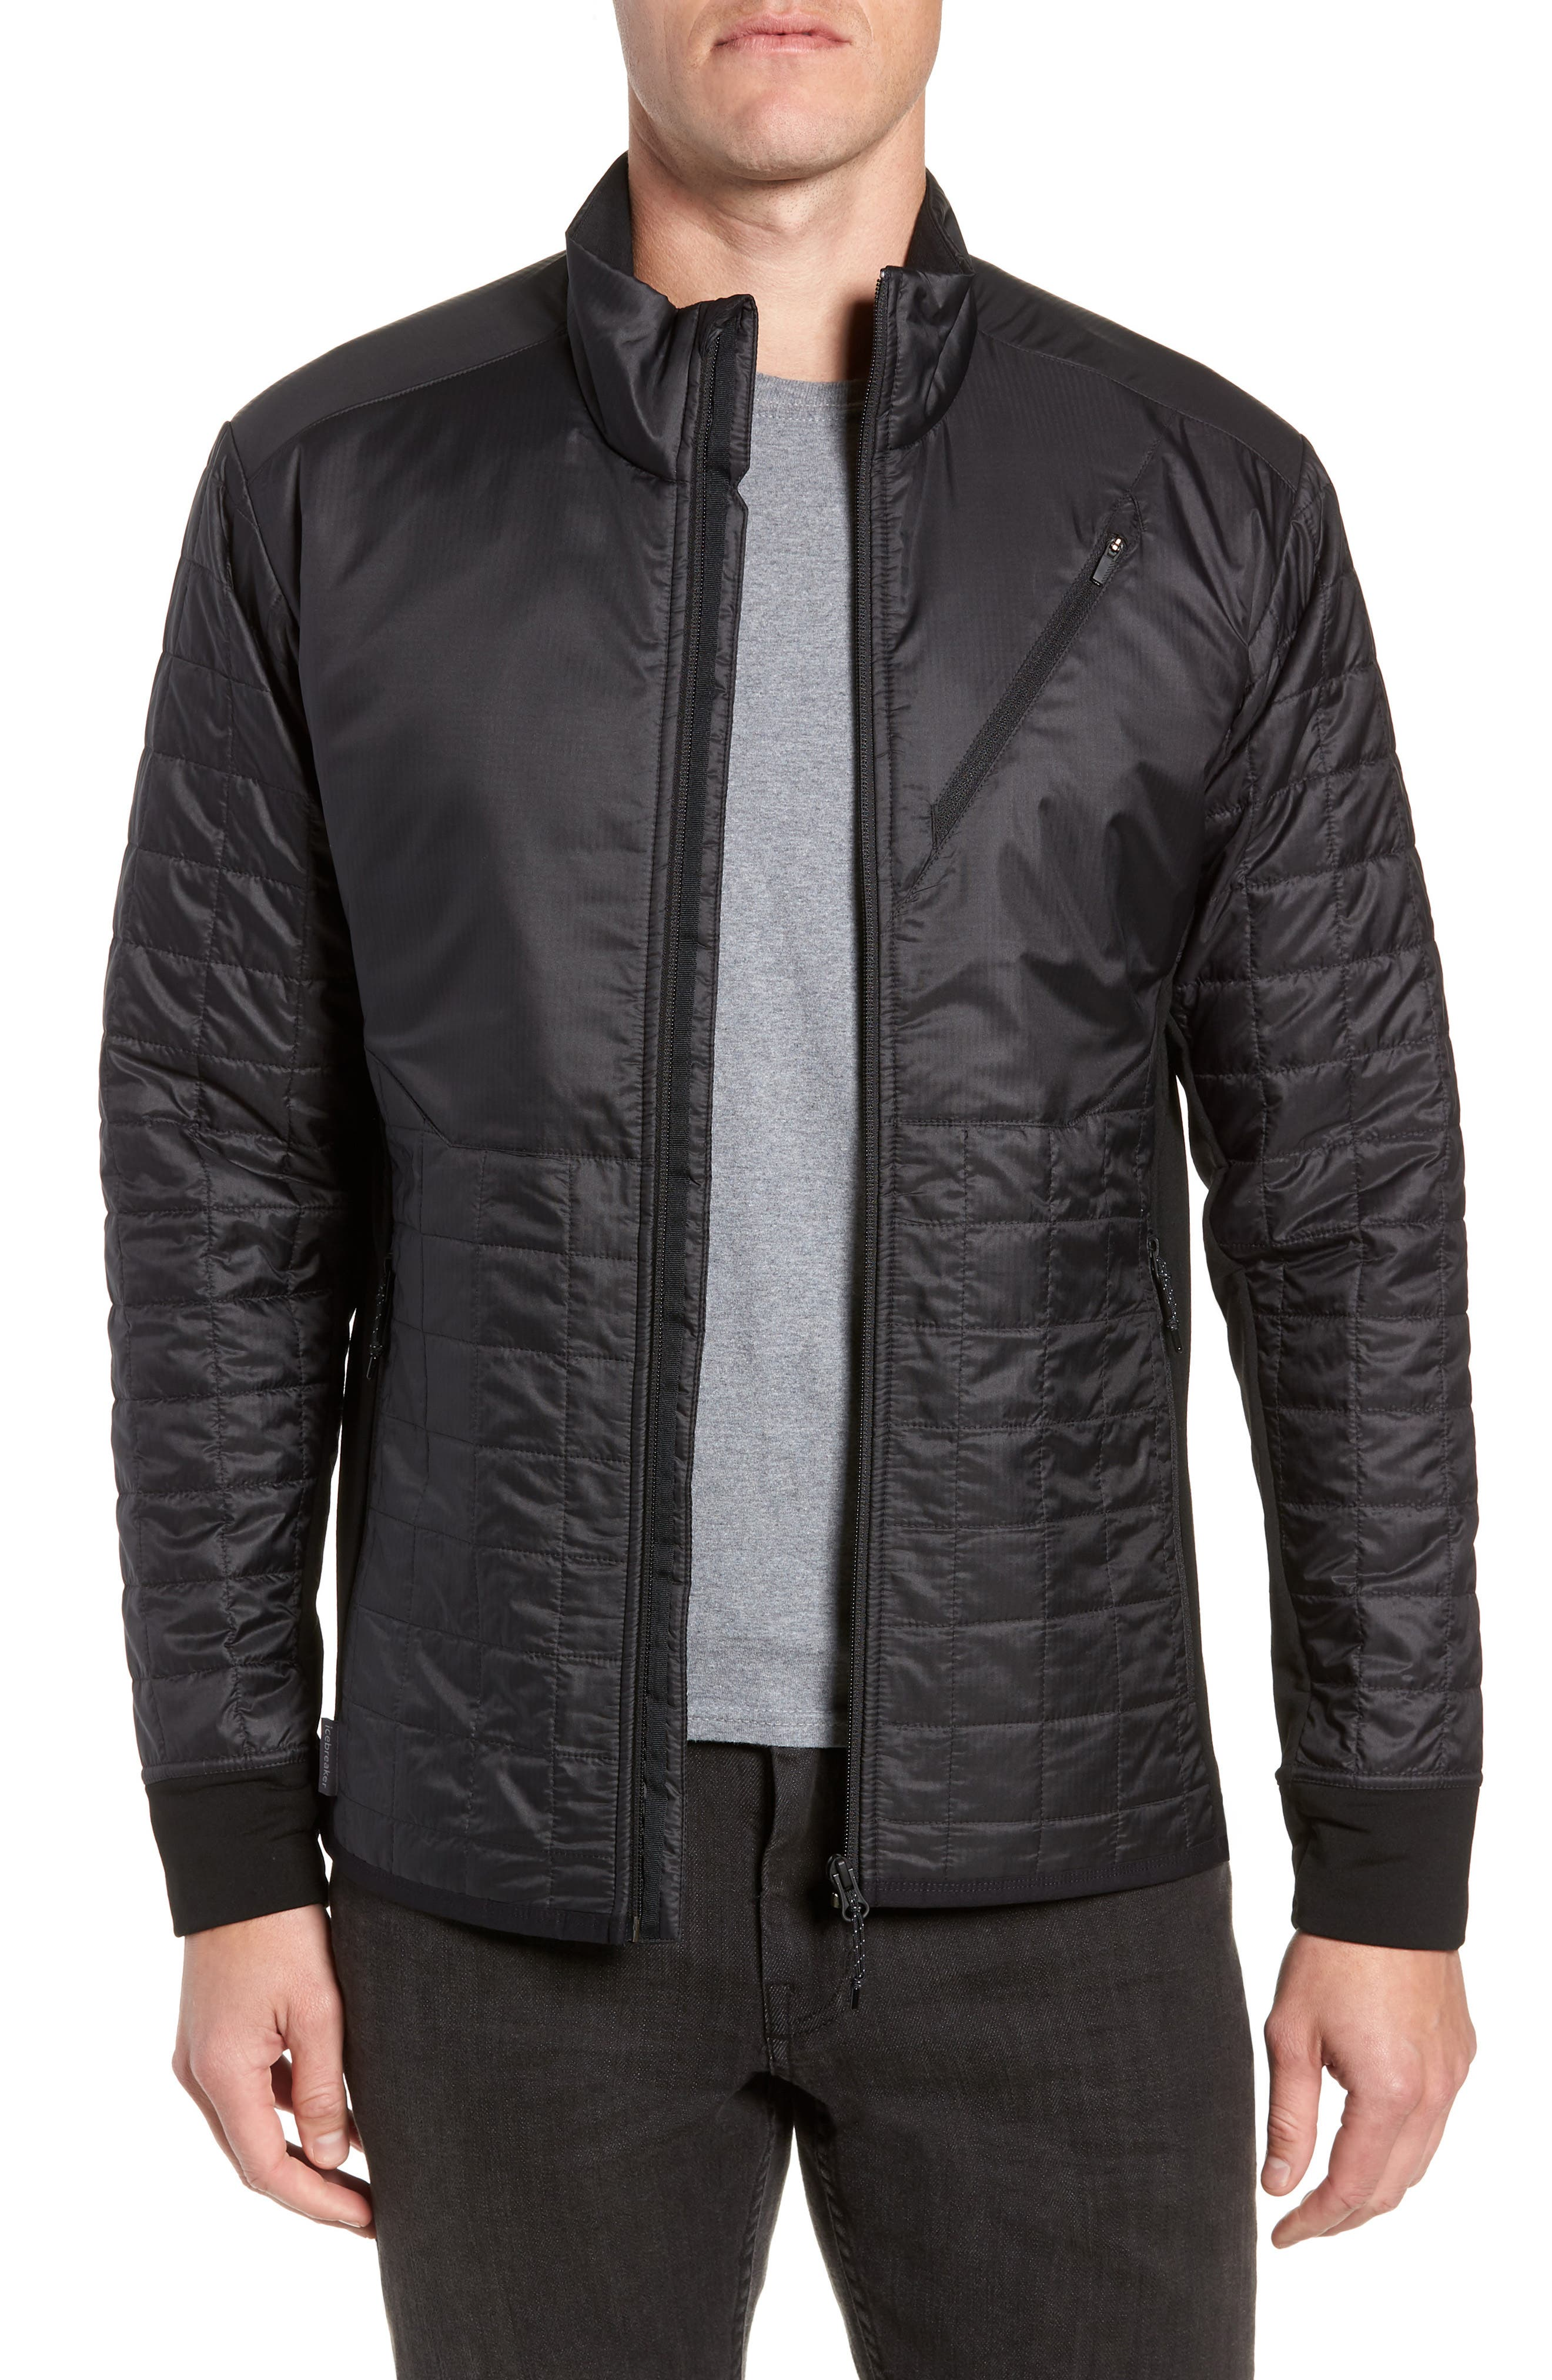 MerinoLOFT<sup>™</sup> Helix Midlayer Zip Jacket,                         Main,                         color, BLACK/ JET HEATHER